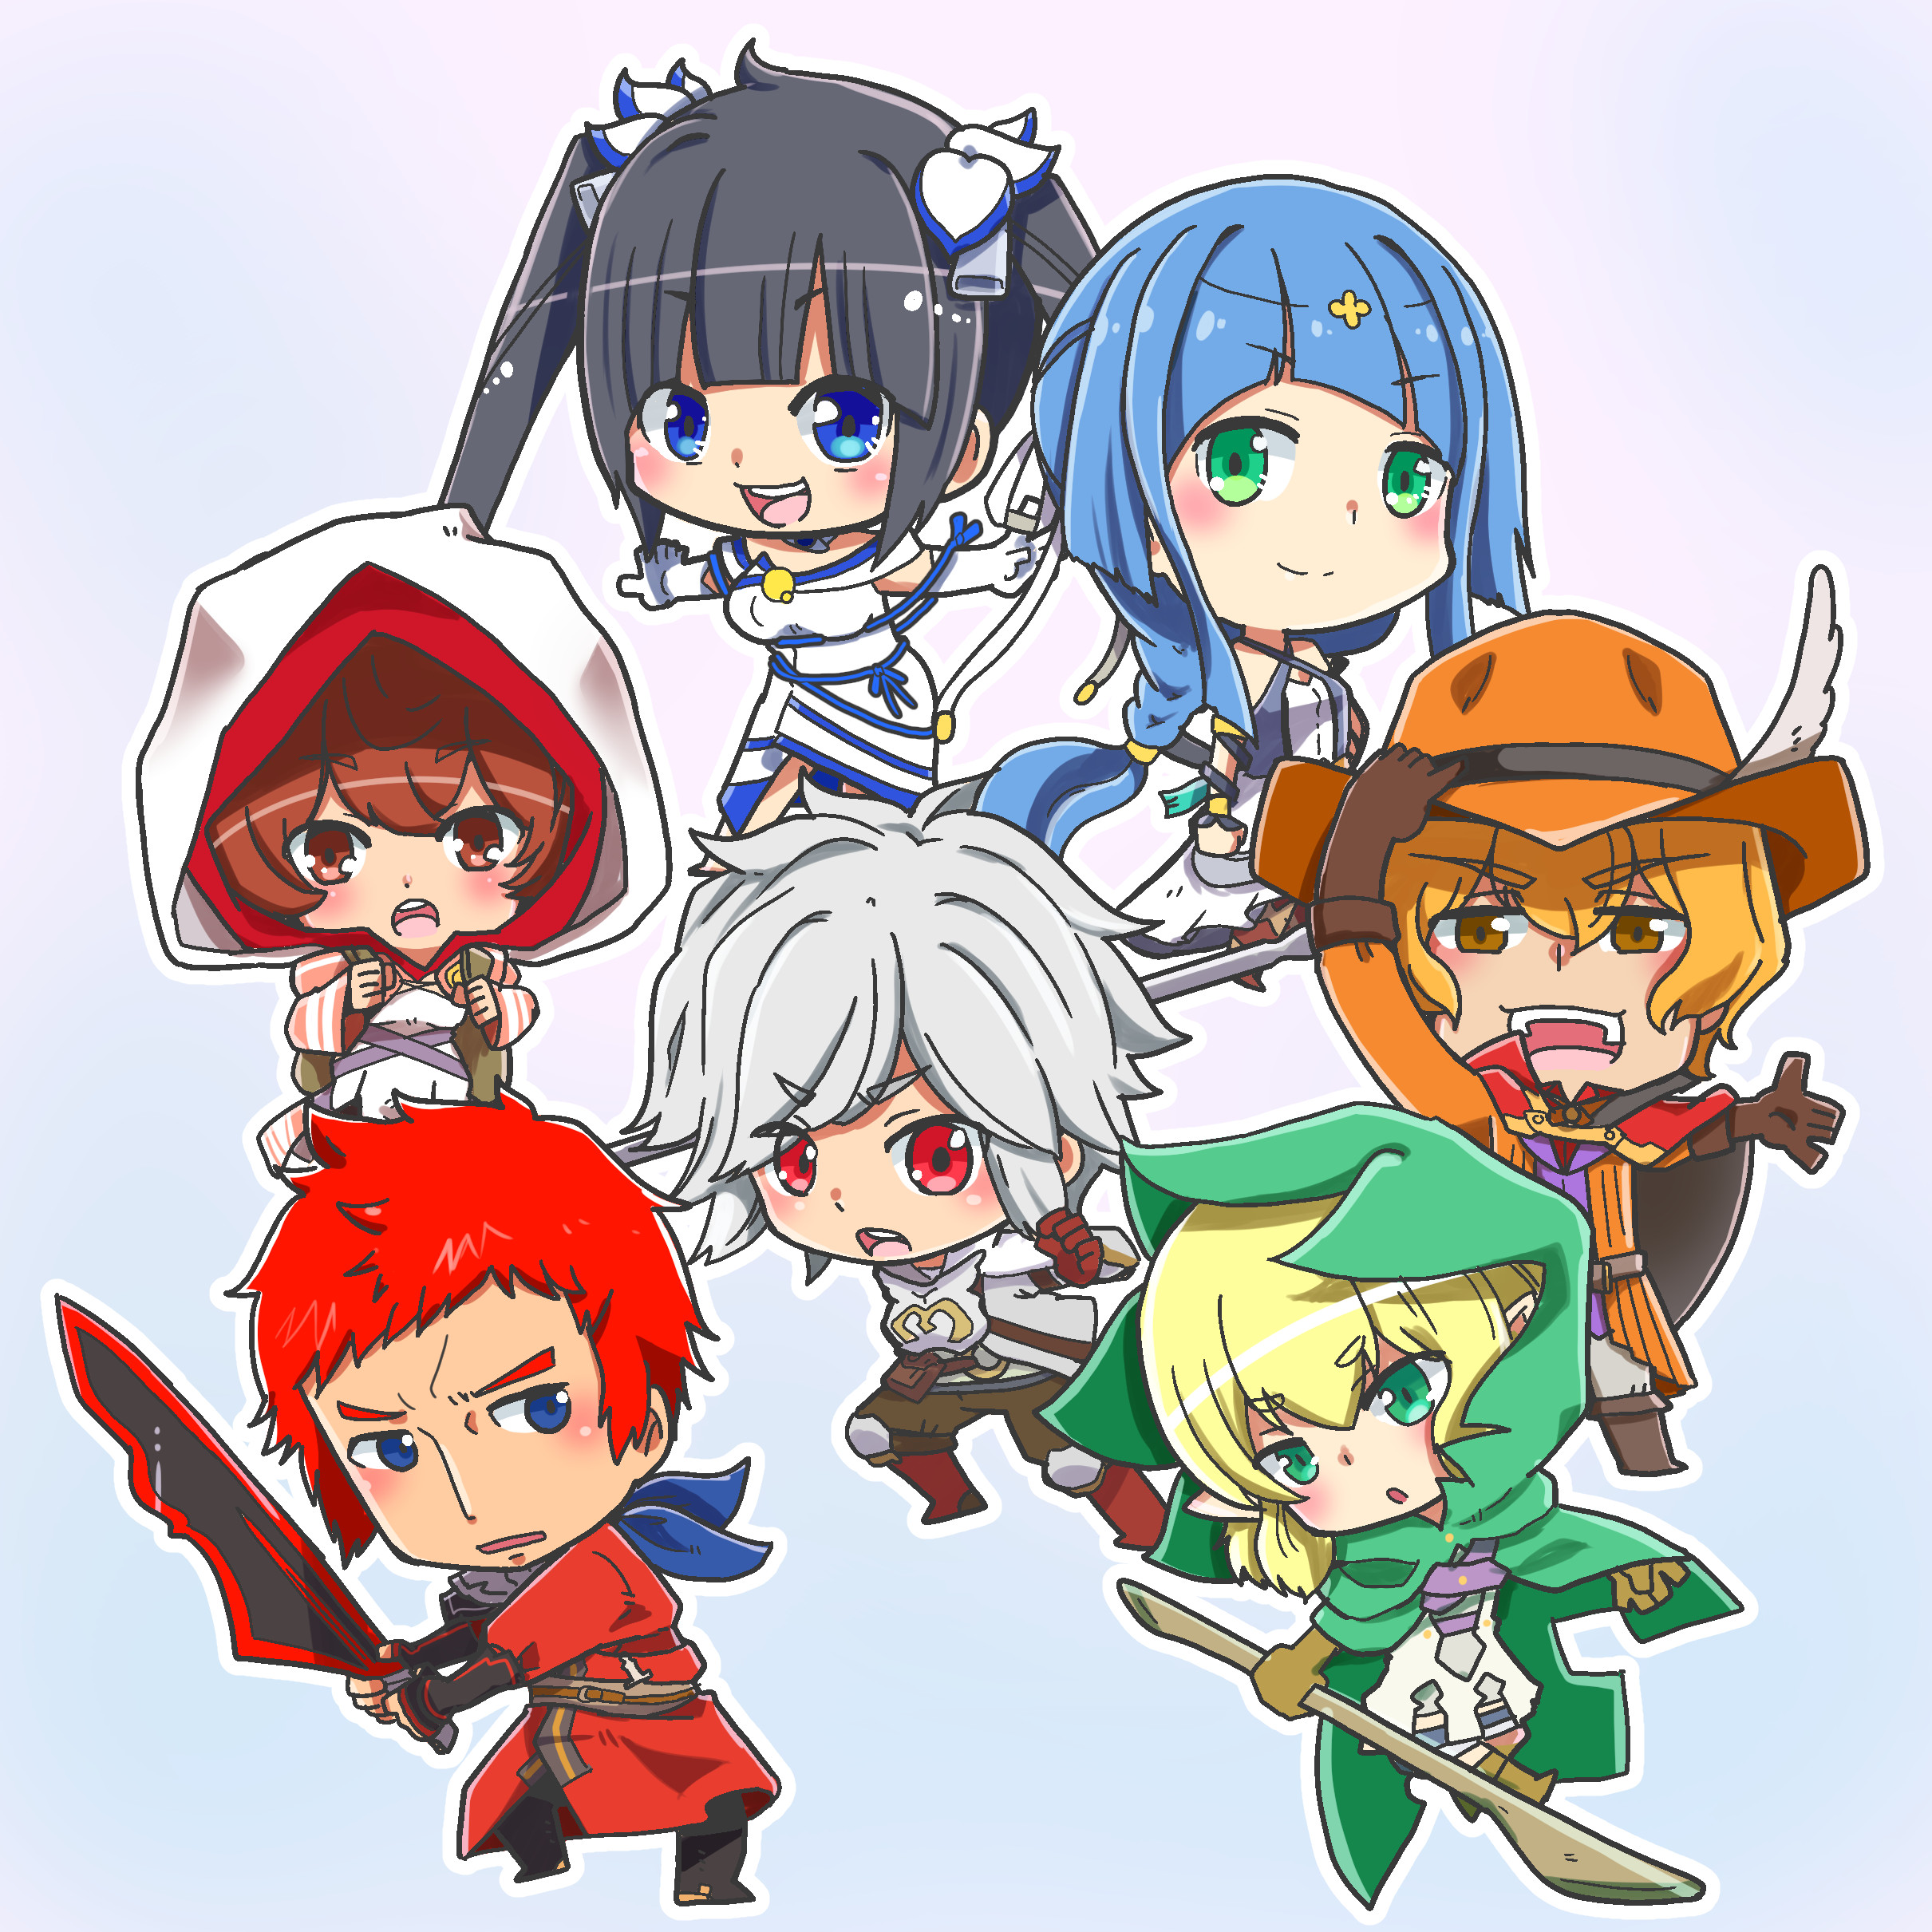 DanMachi: Arrow Of The Orion Image #2582126 - Zerochan Anime